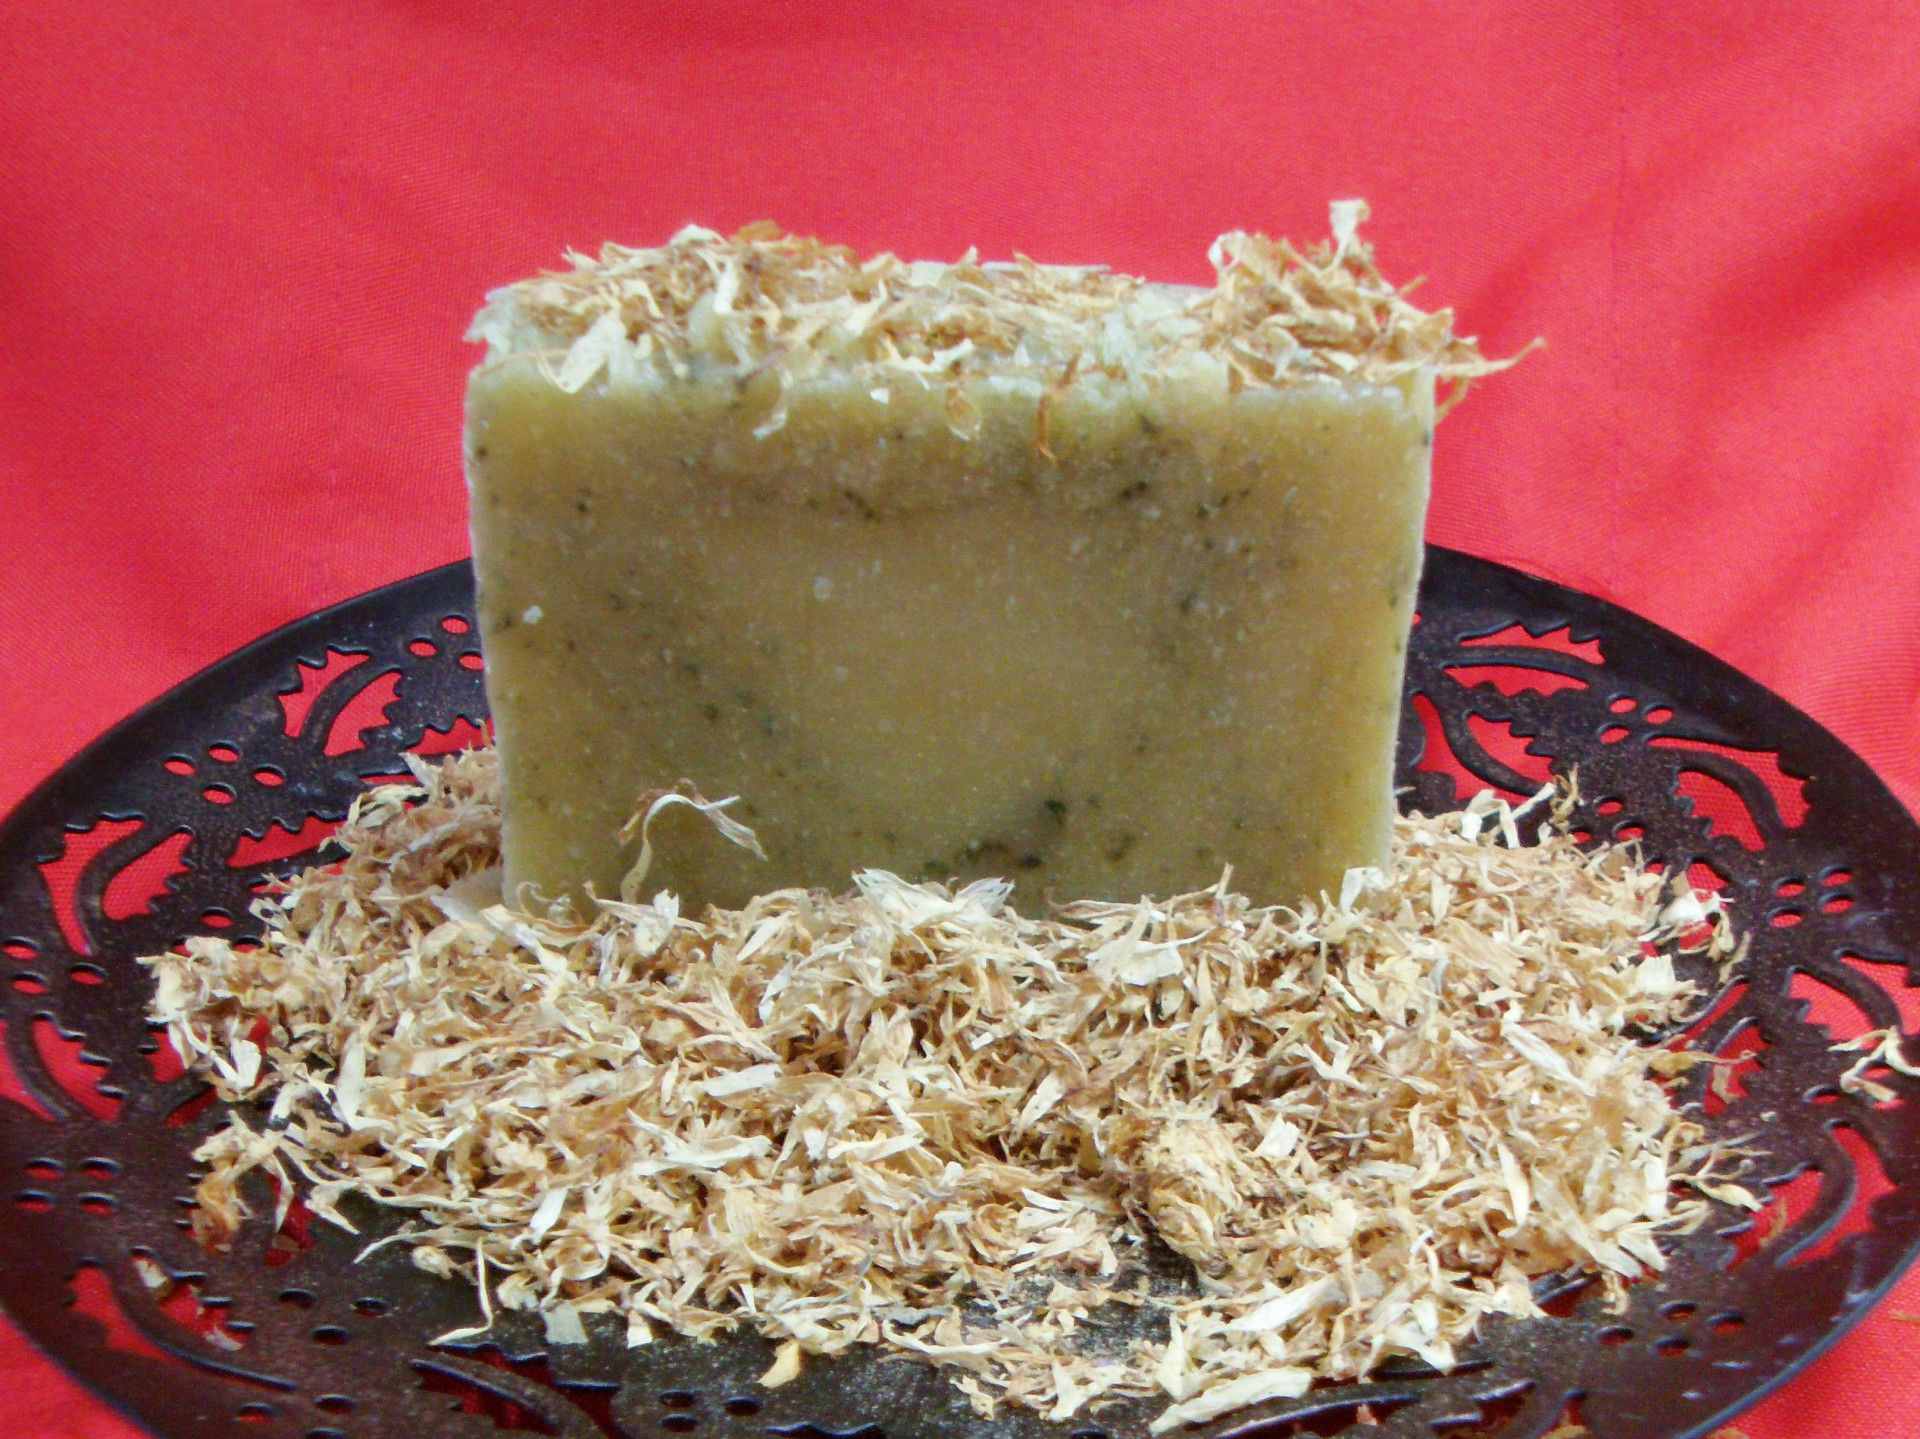 Vegan Aloe Calendula Soap, spirulina powder, Organic Calendula flowers, revitalizes skin, quenches the thrist of moisture-starved skin.